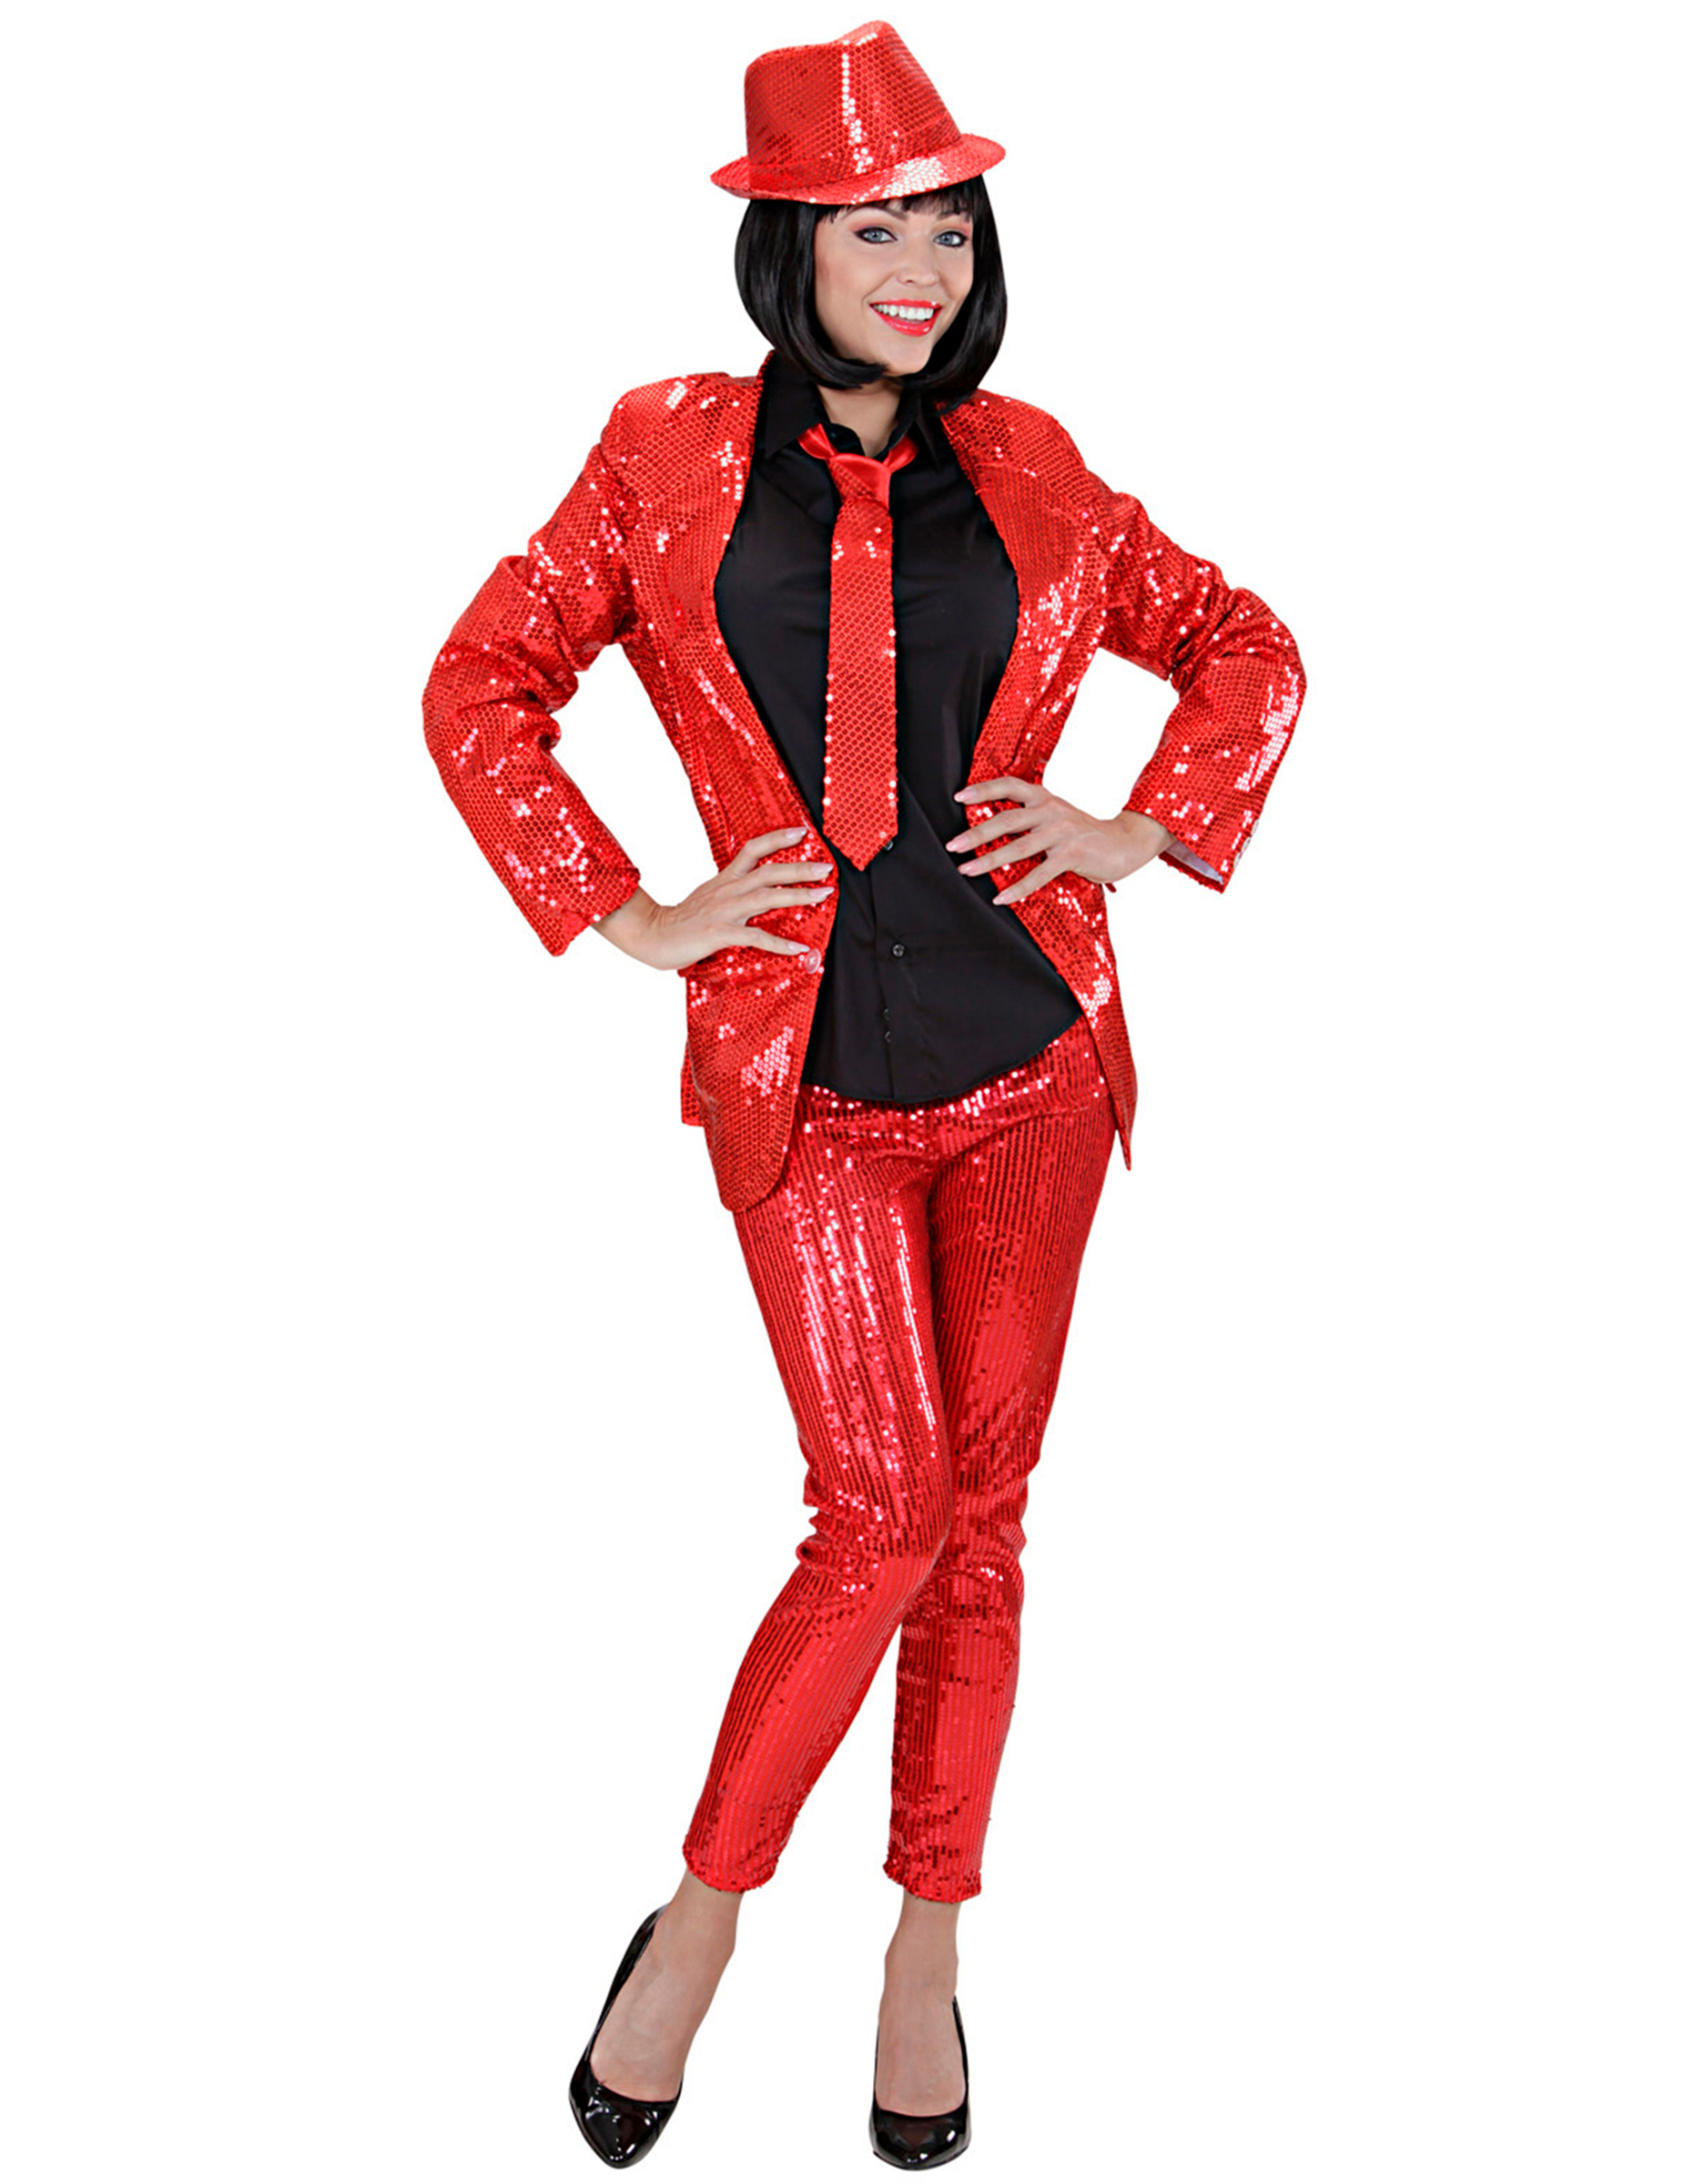 Mottoparty Las Vegas Kleidung Und Kostume Vegaoo De Fasching